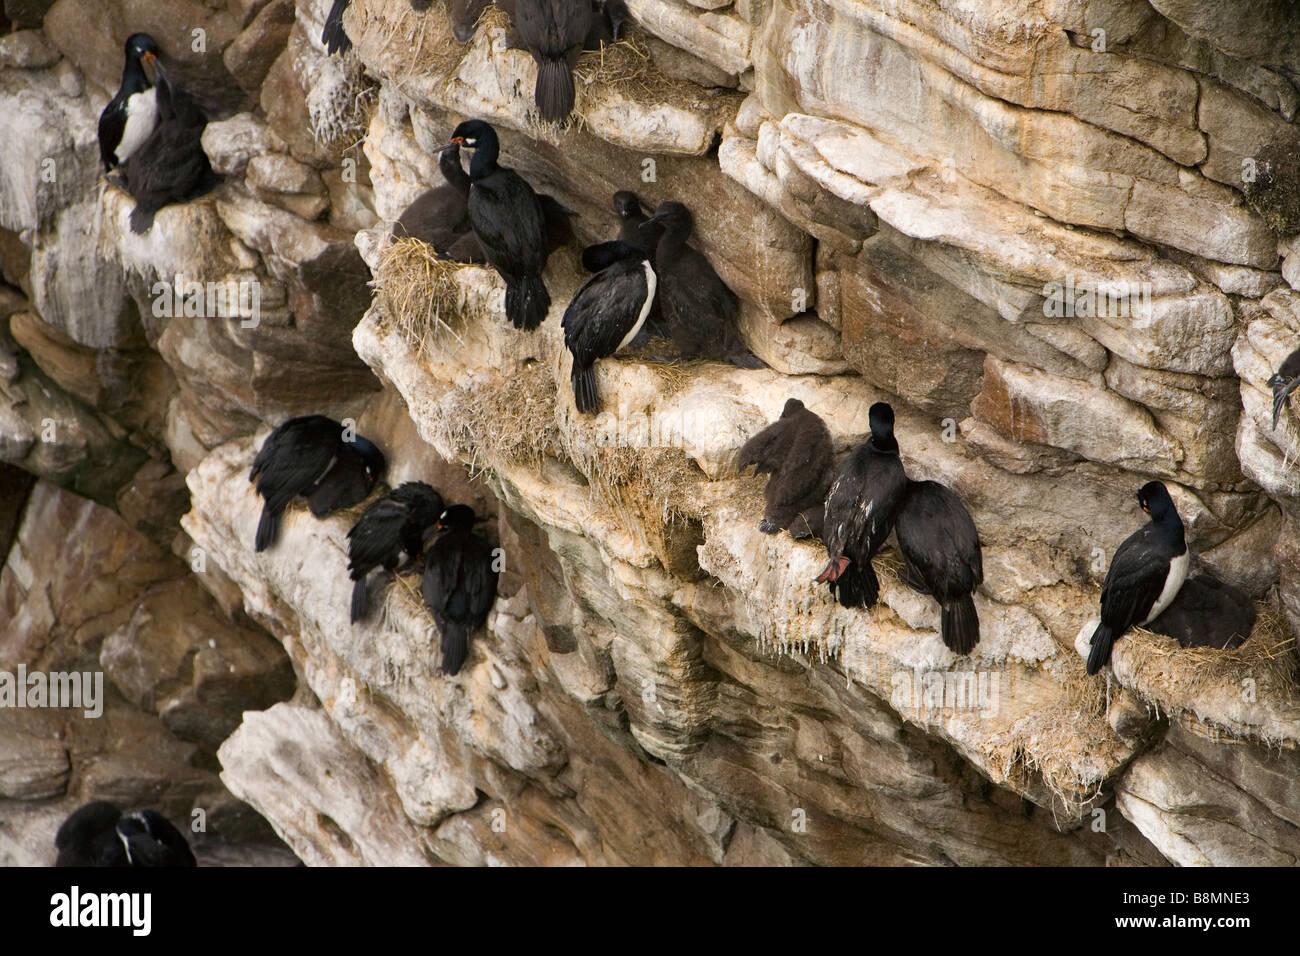 A nesting colony of Rock Shags (Phalacrocorax magellanicus) onThe Falkland Islands. - Stock Image